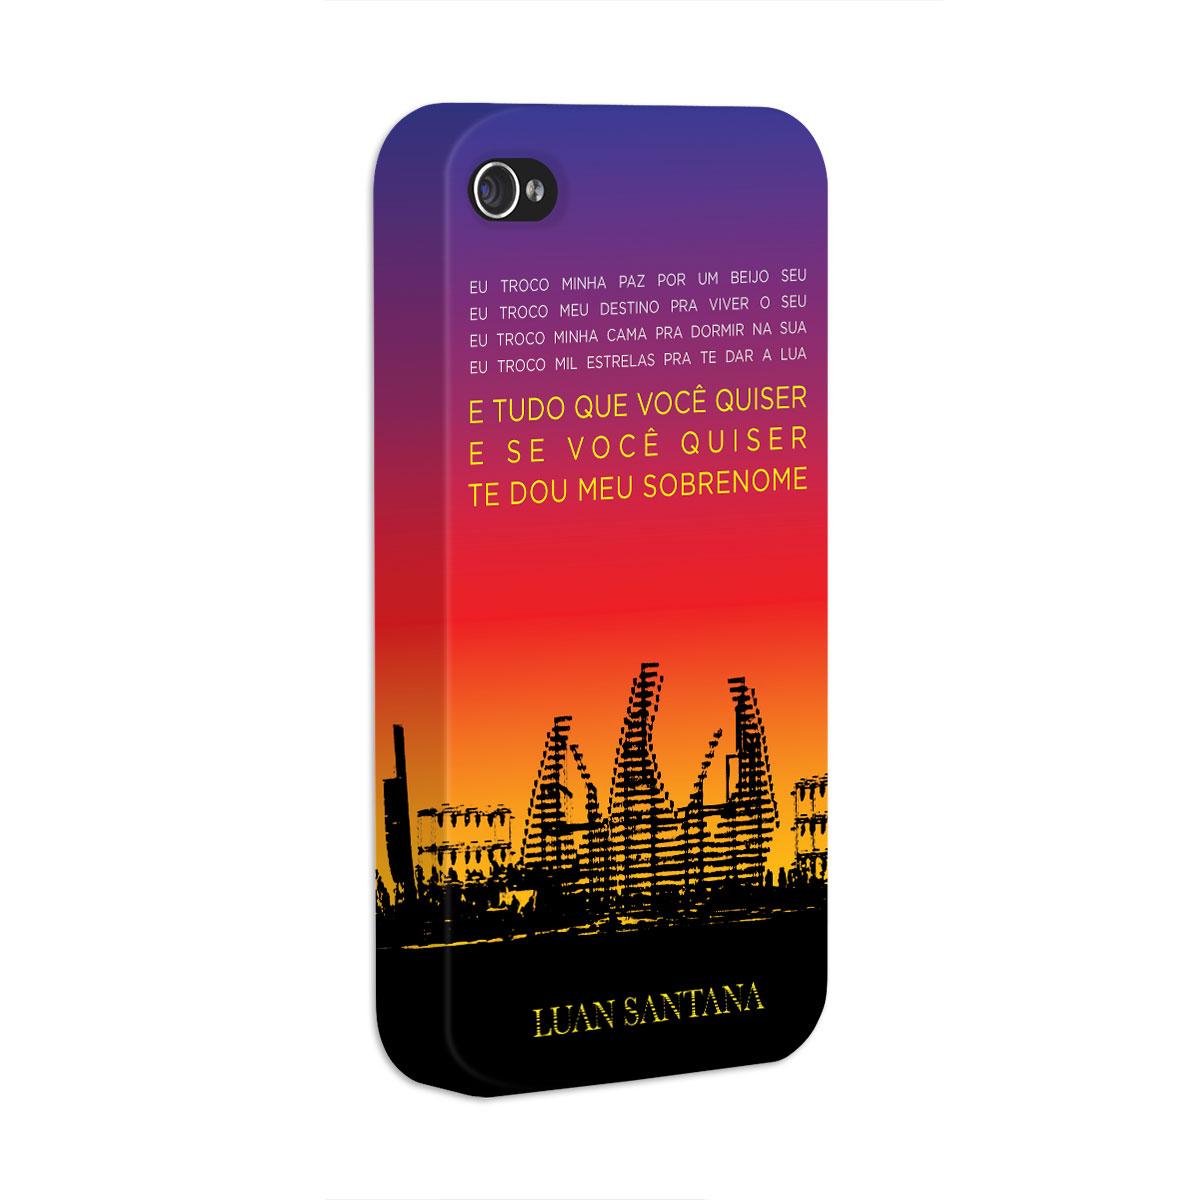 Kit Com 3 Capas de iPhone 4/4S Luan Santana Concept